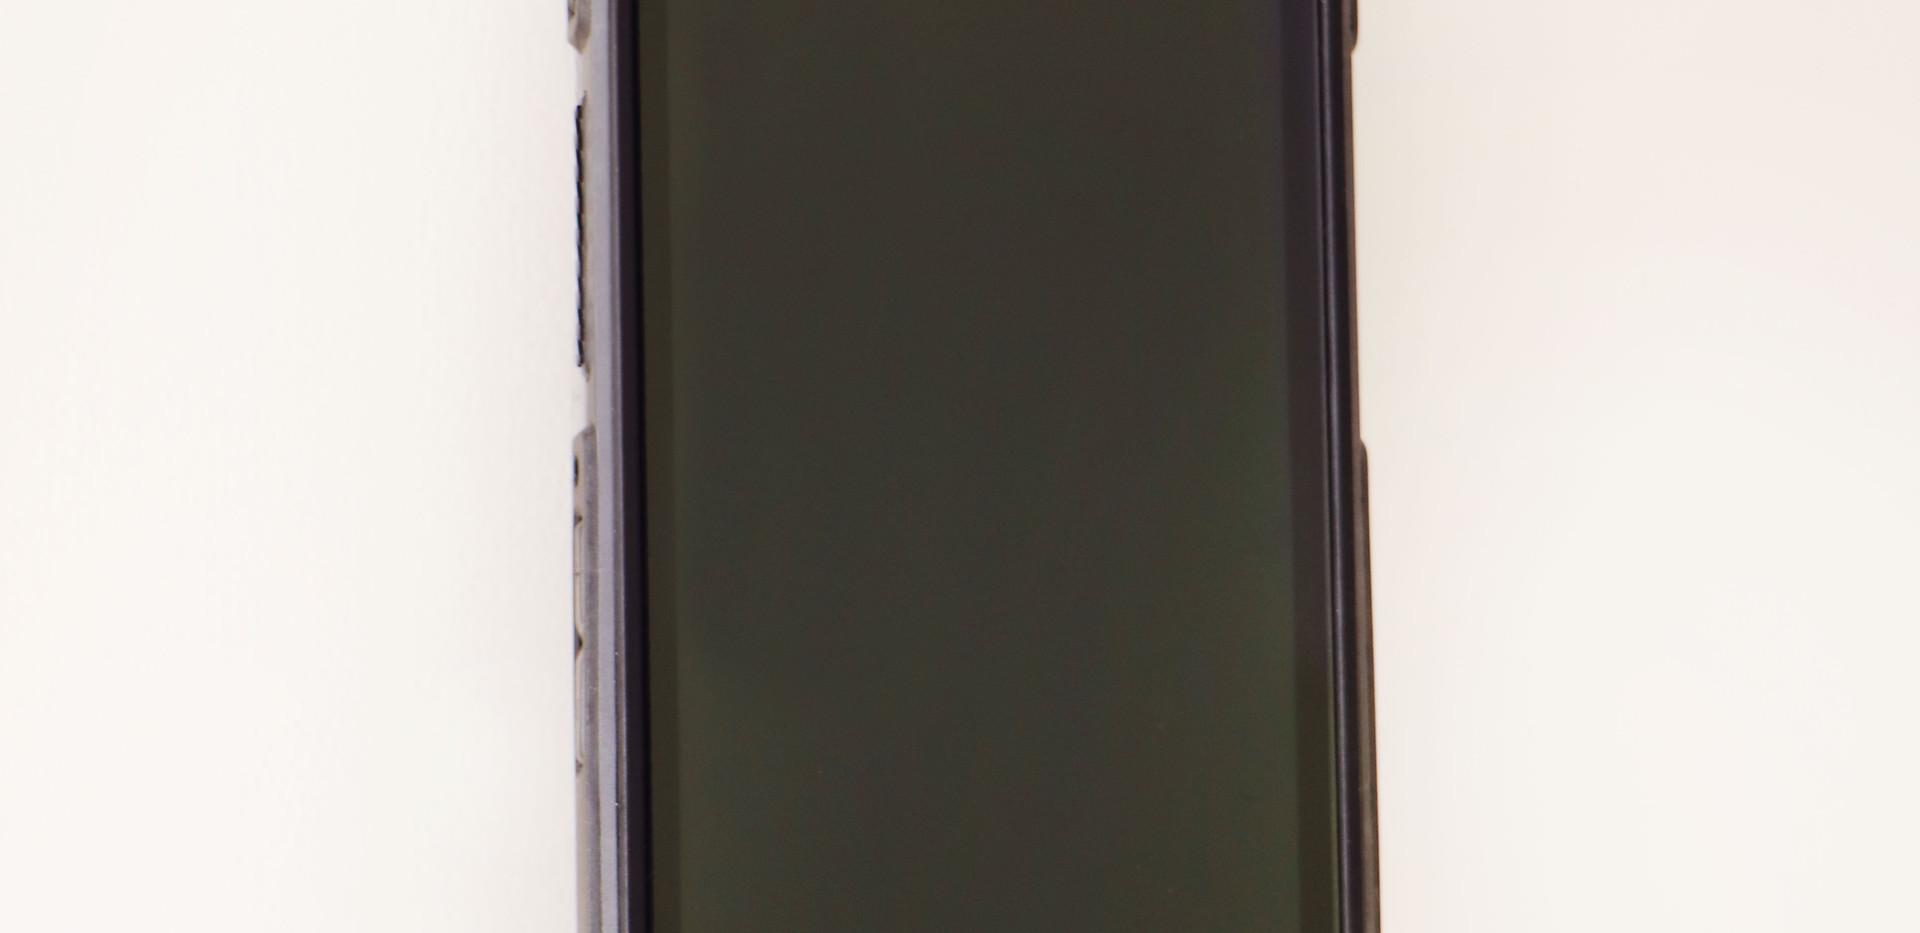 Sonim Smartphone